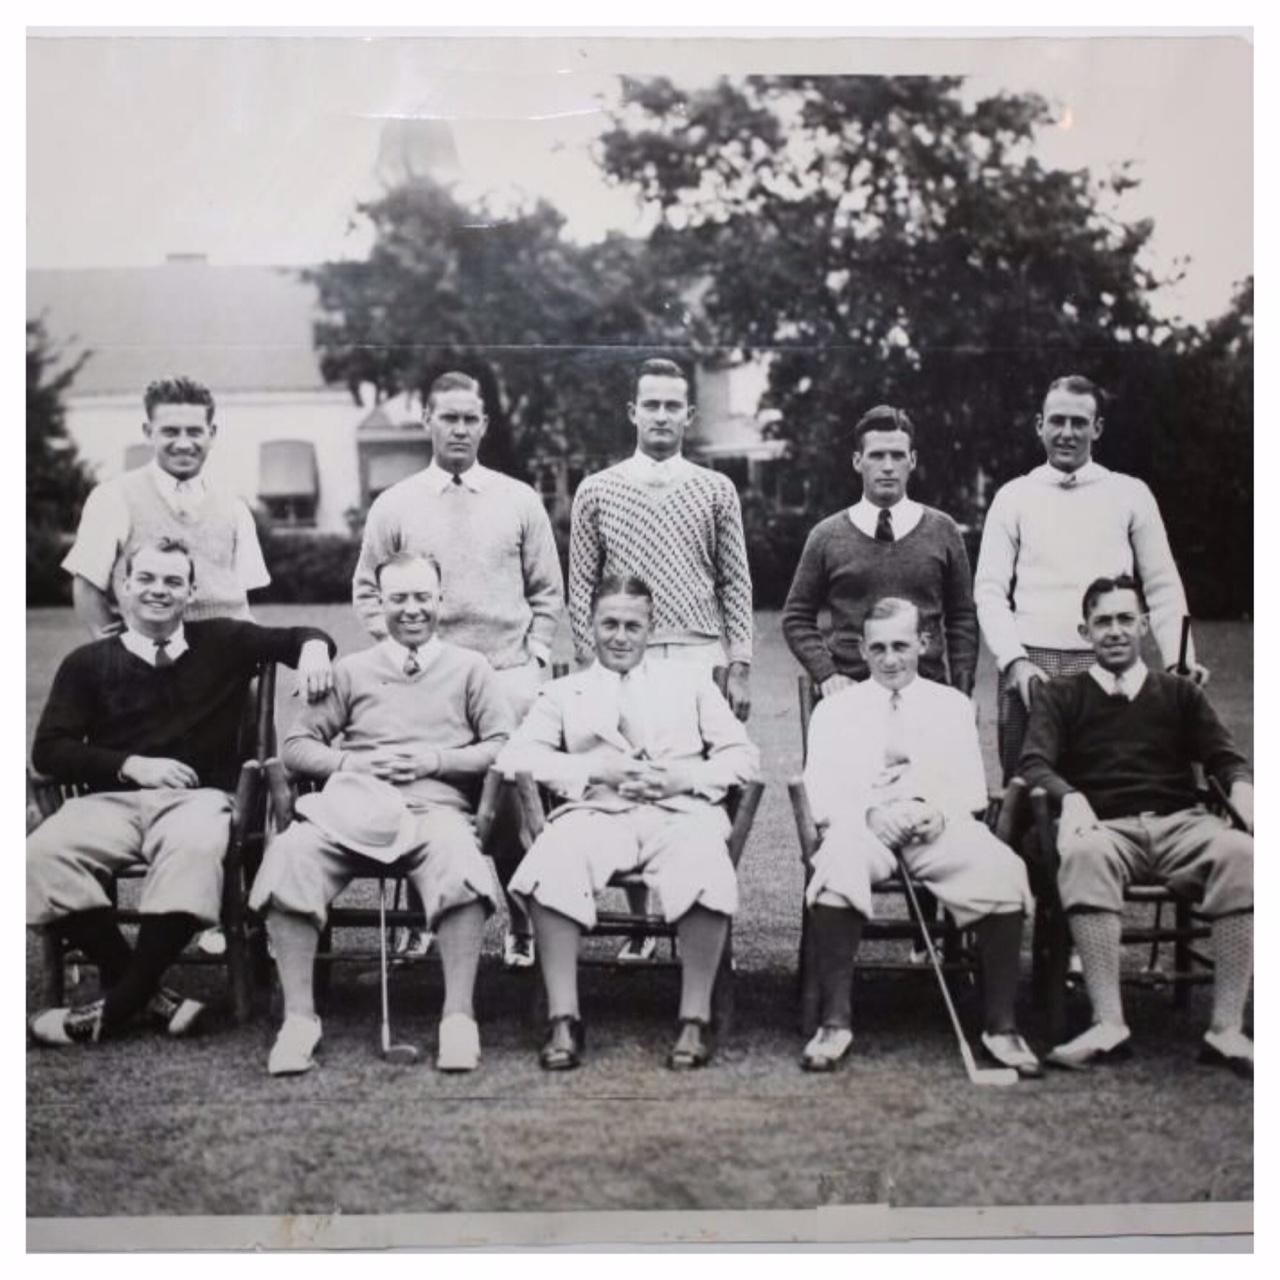 WC 1928 USA Team